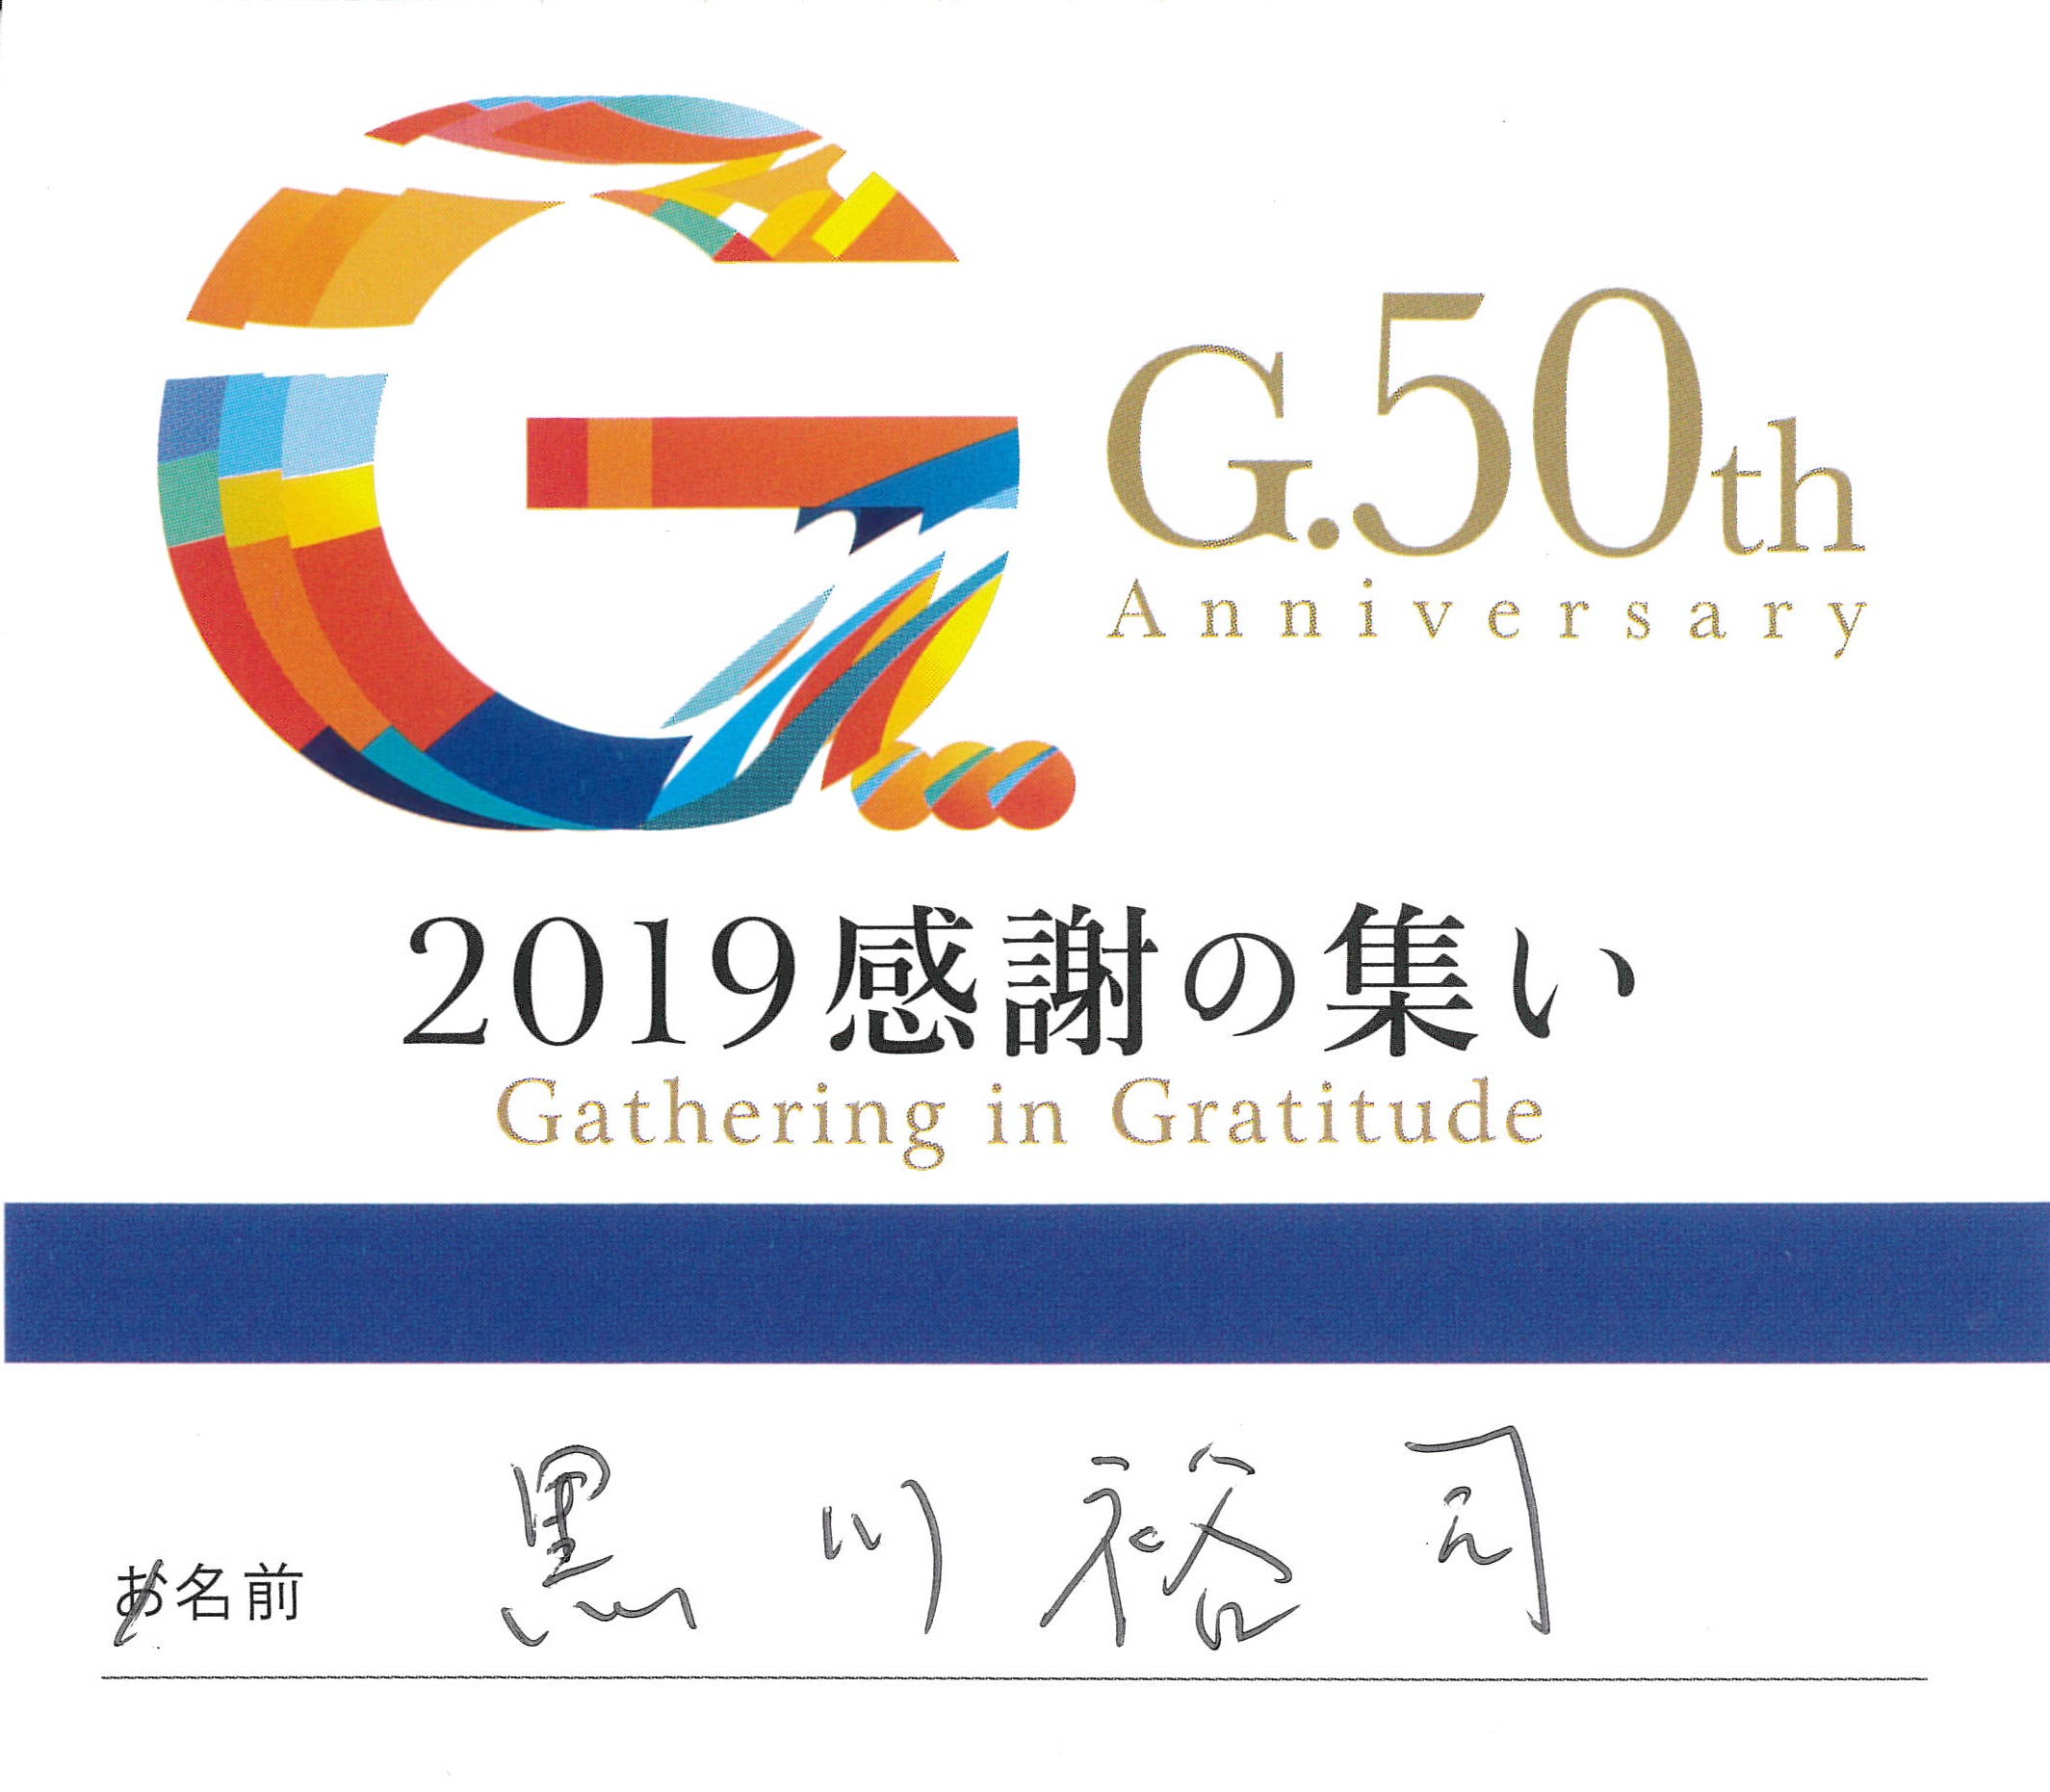 GLA 2019 感謝の集い 名札